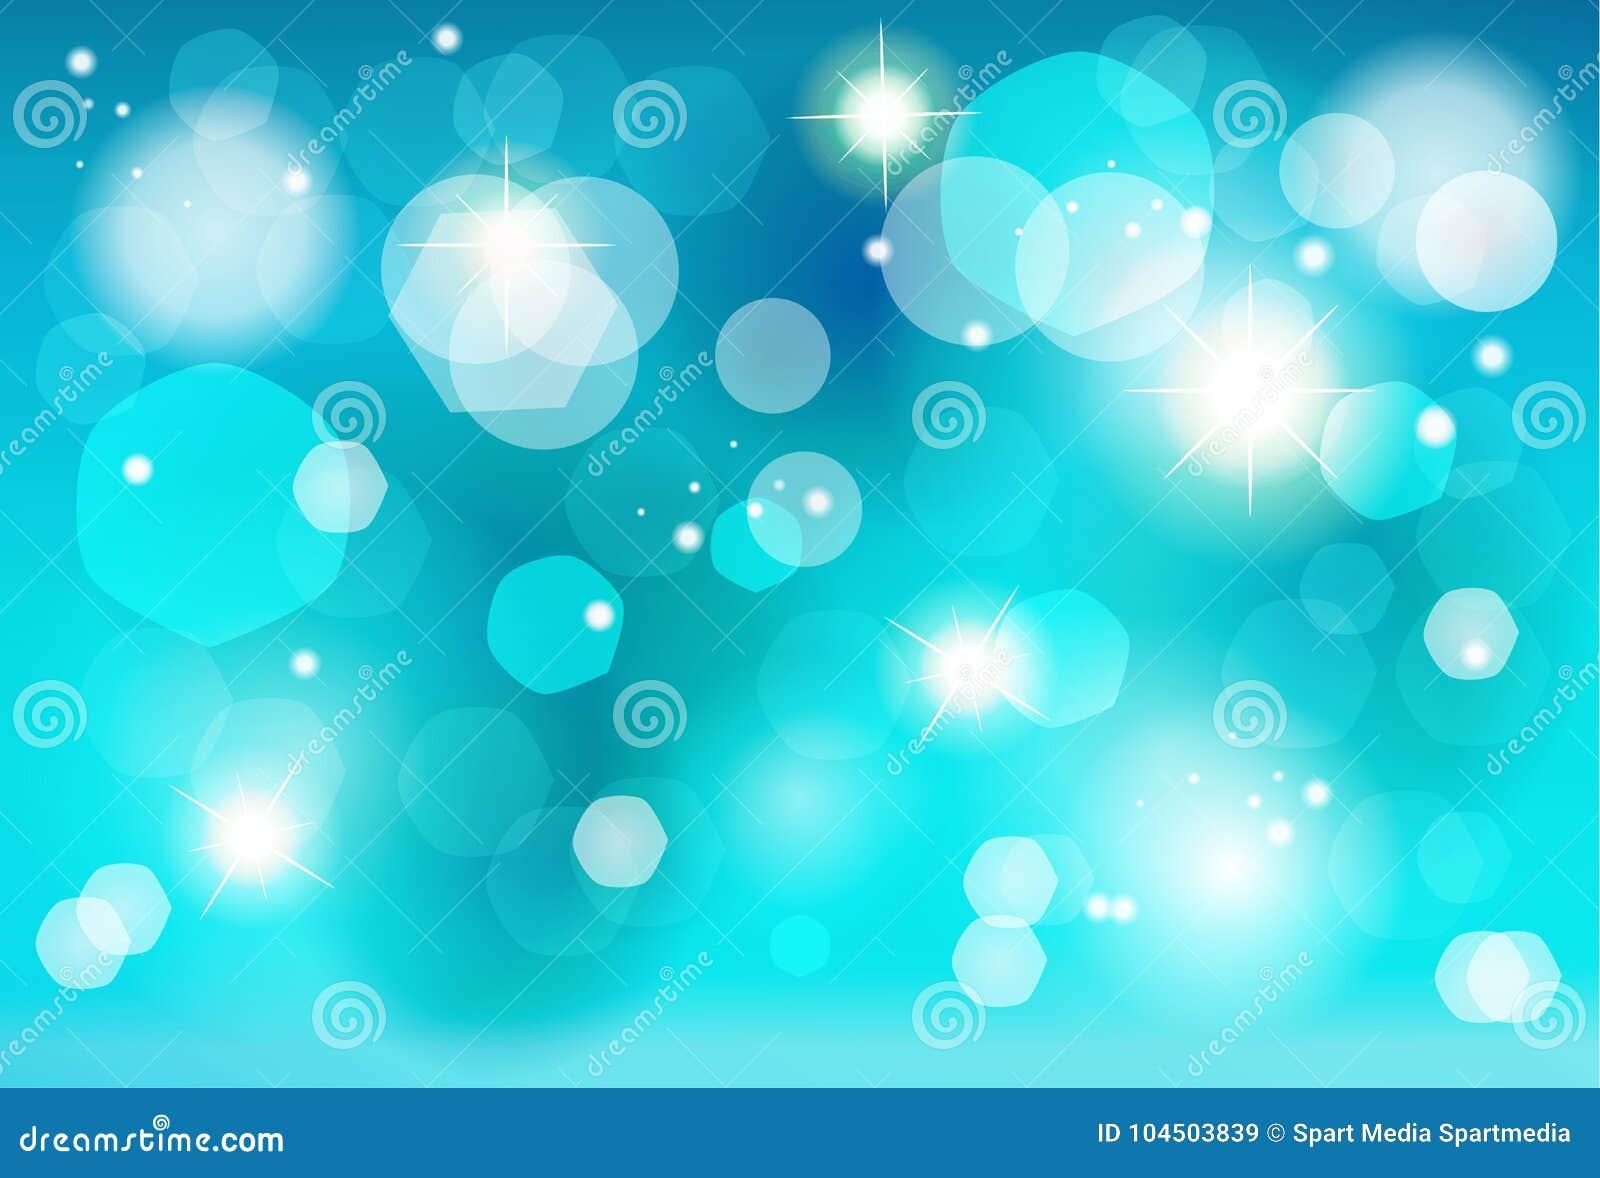 Christmas Blue Bokeh Lights Effect Wallpaper Stock Vector